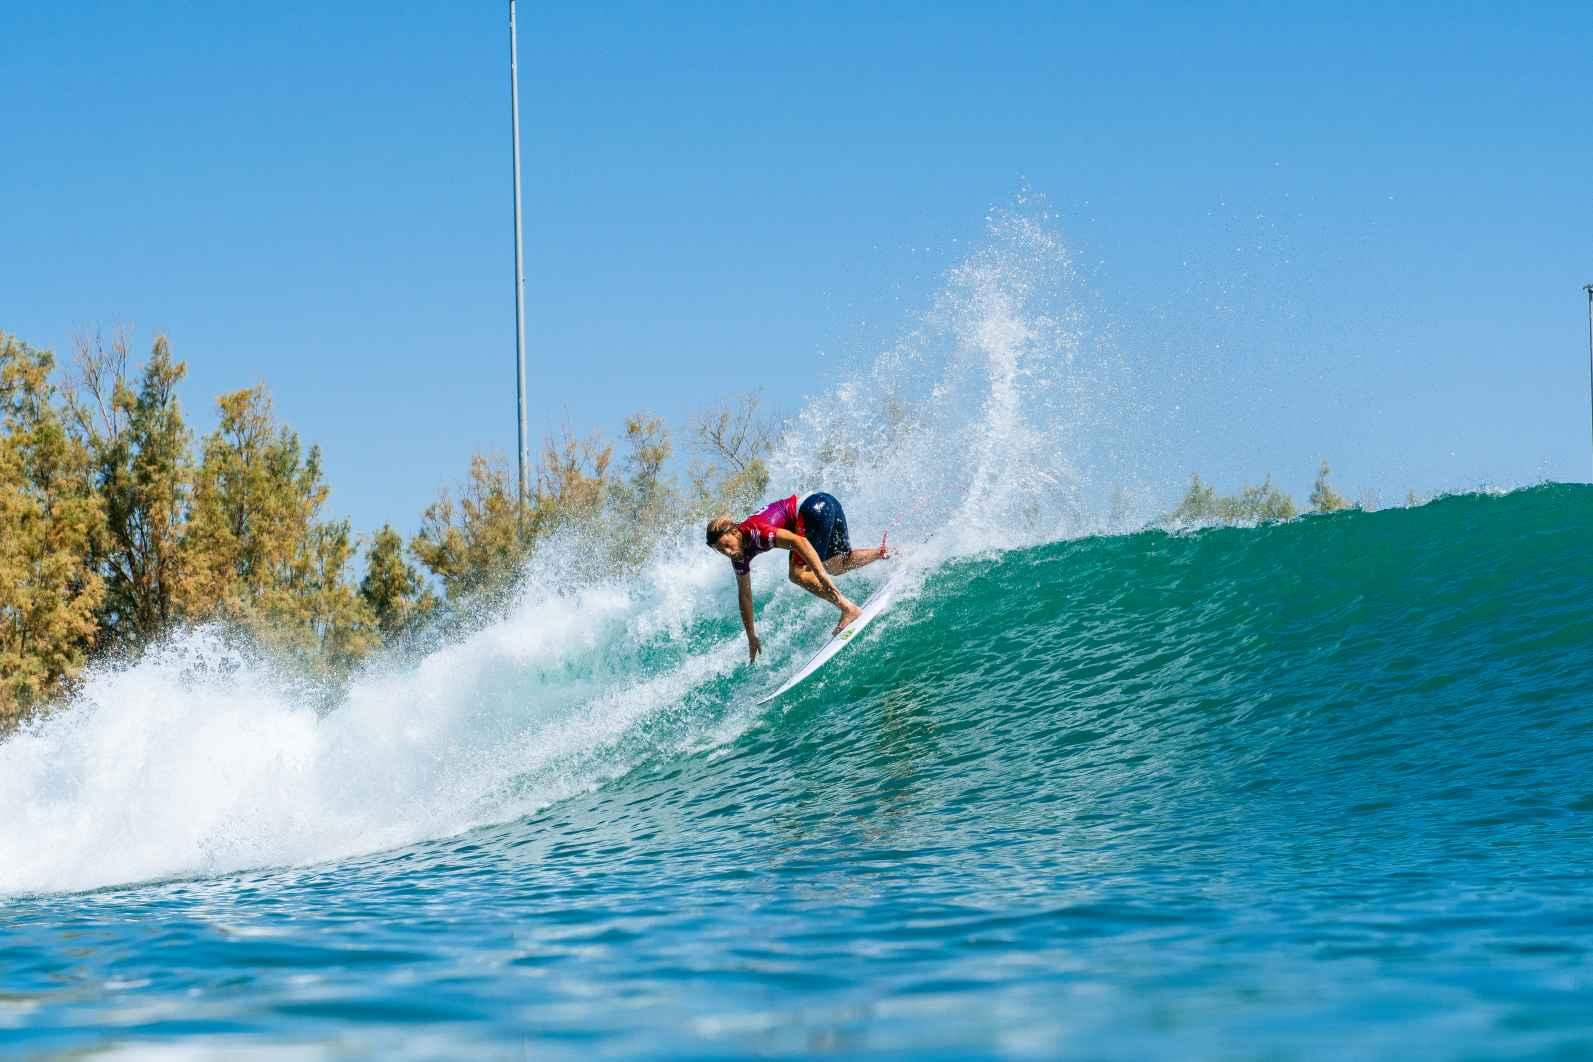 surf30 surf ranch pro 2021 wsl surf Coffin C Ranch21 PNN 2290